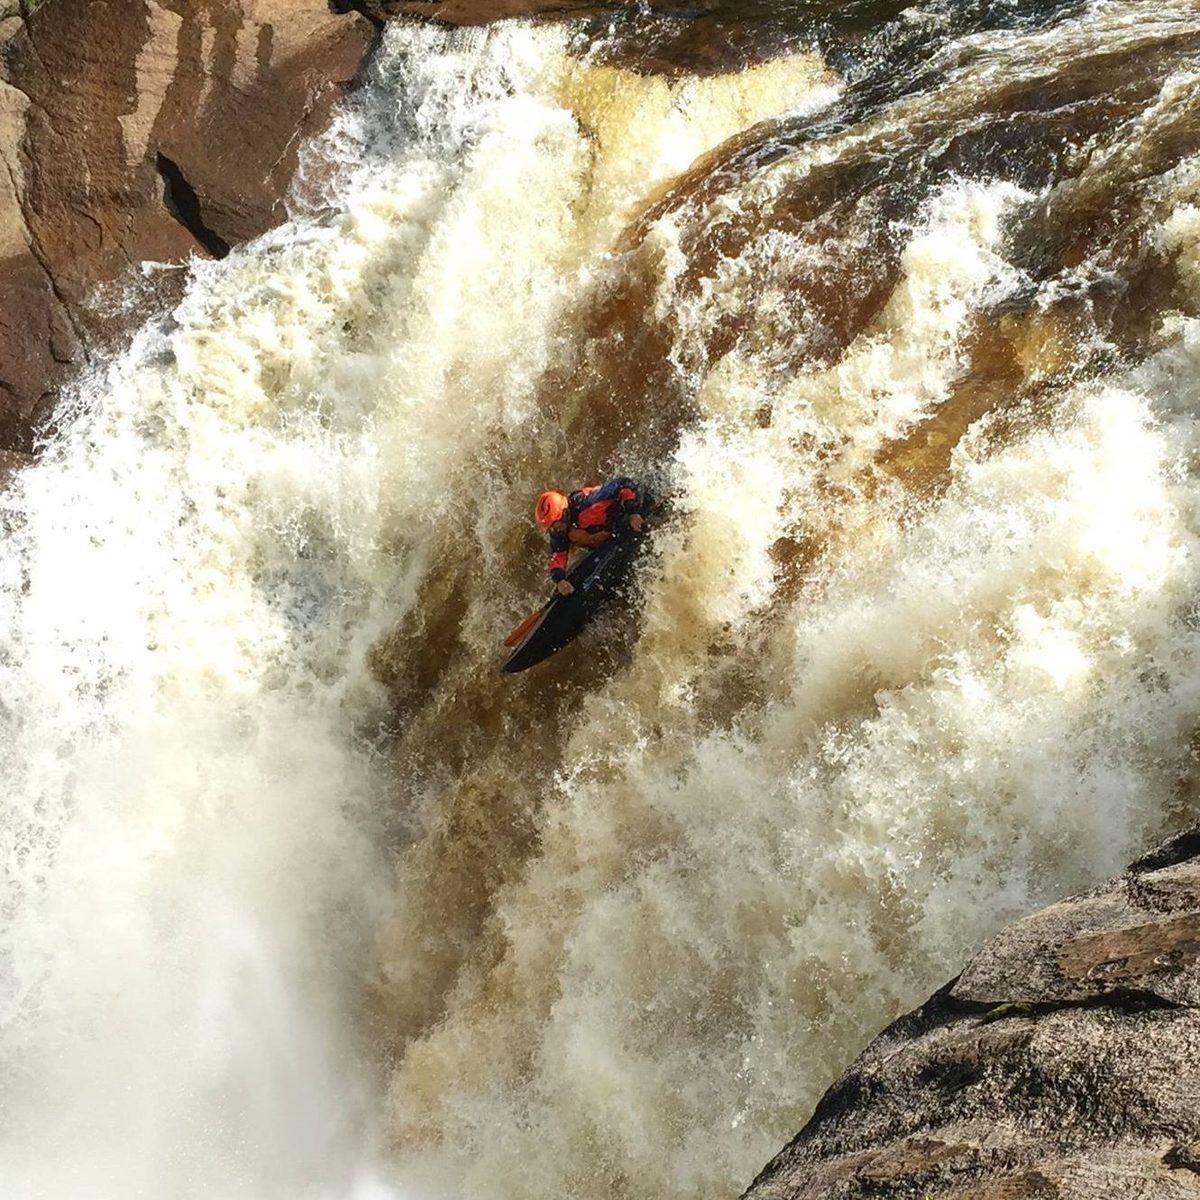 Advanced Whitewater Kayak Trip